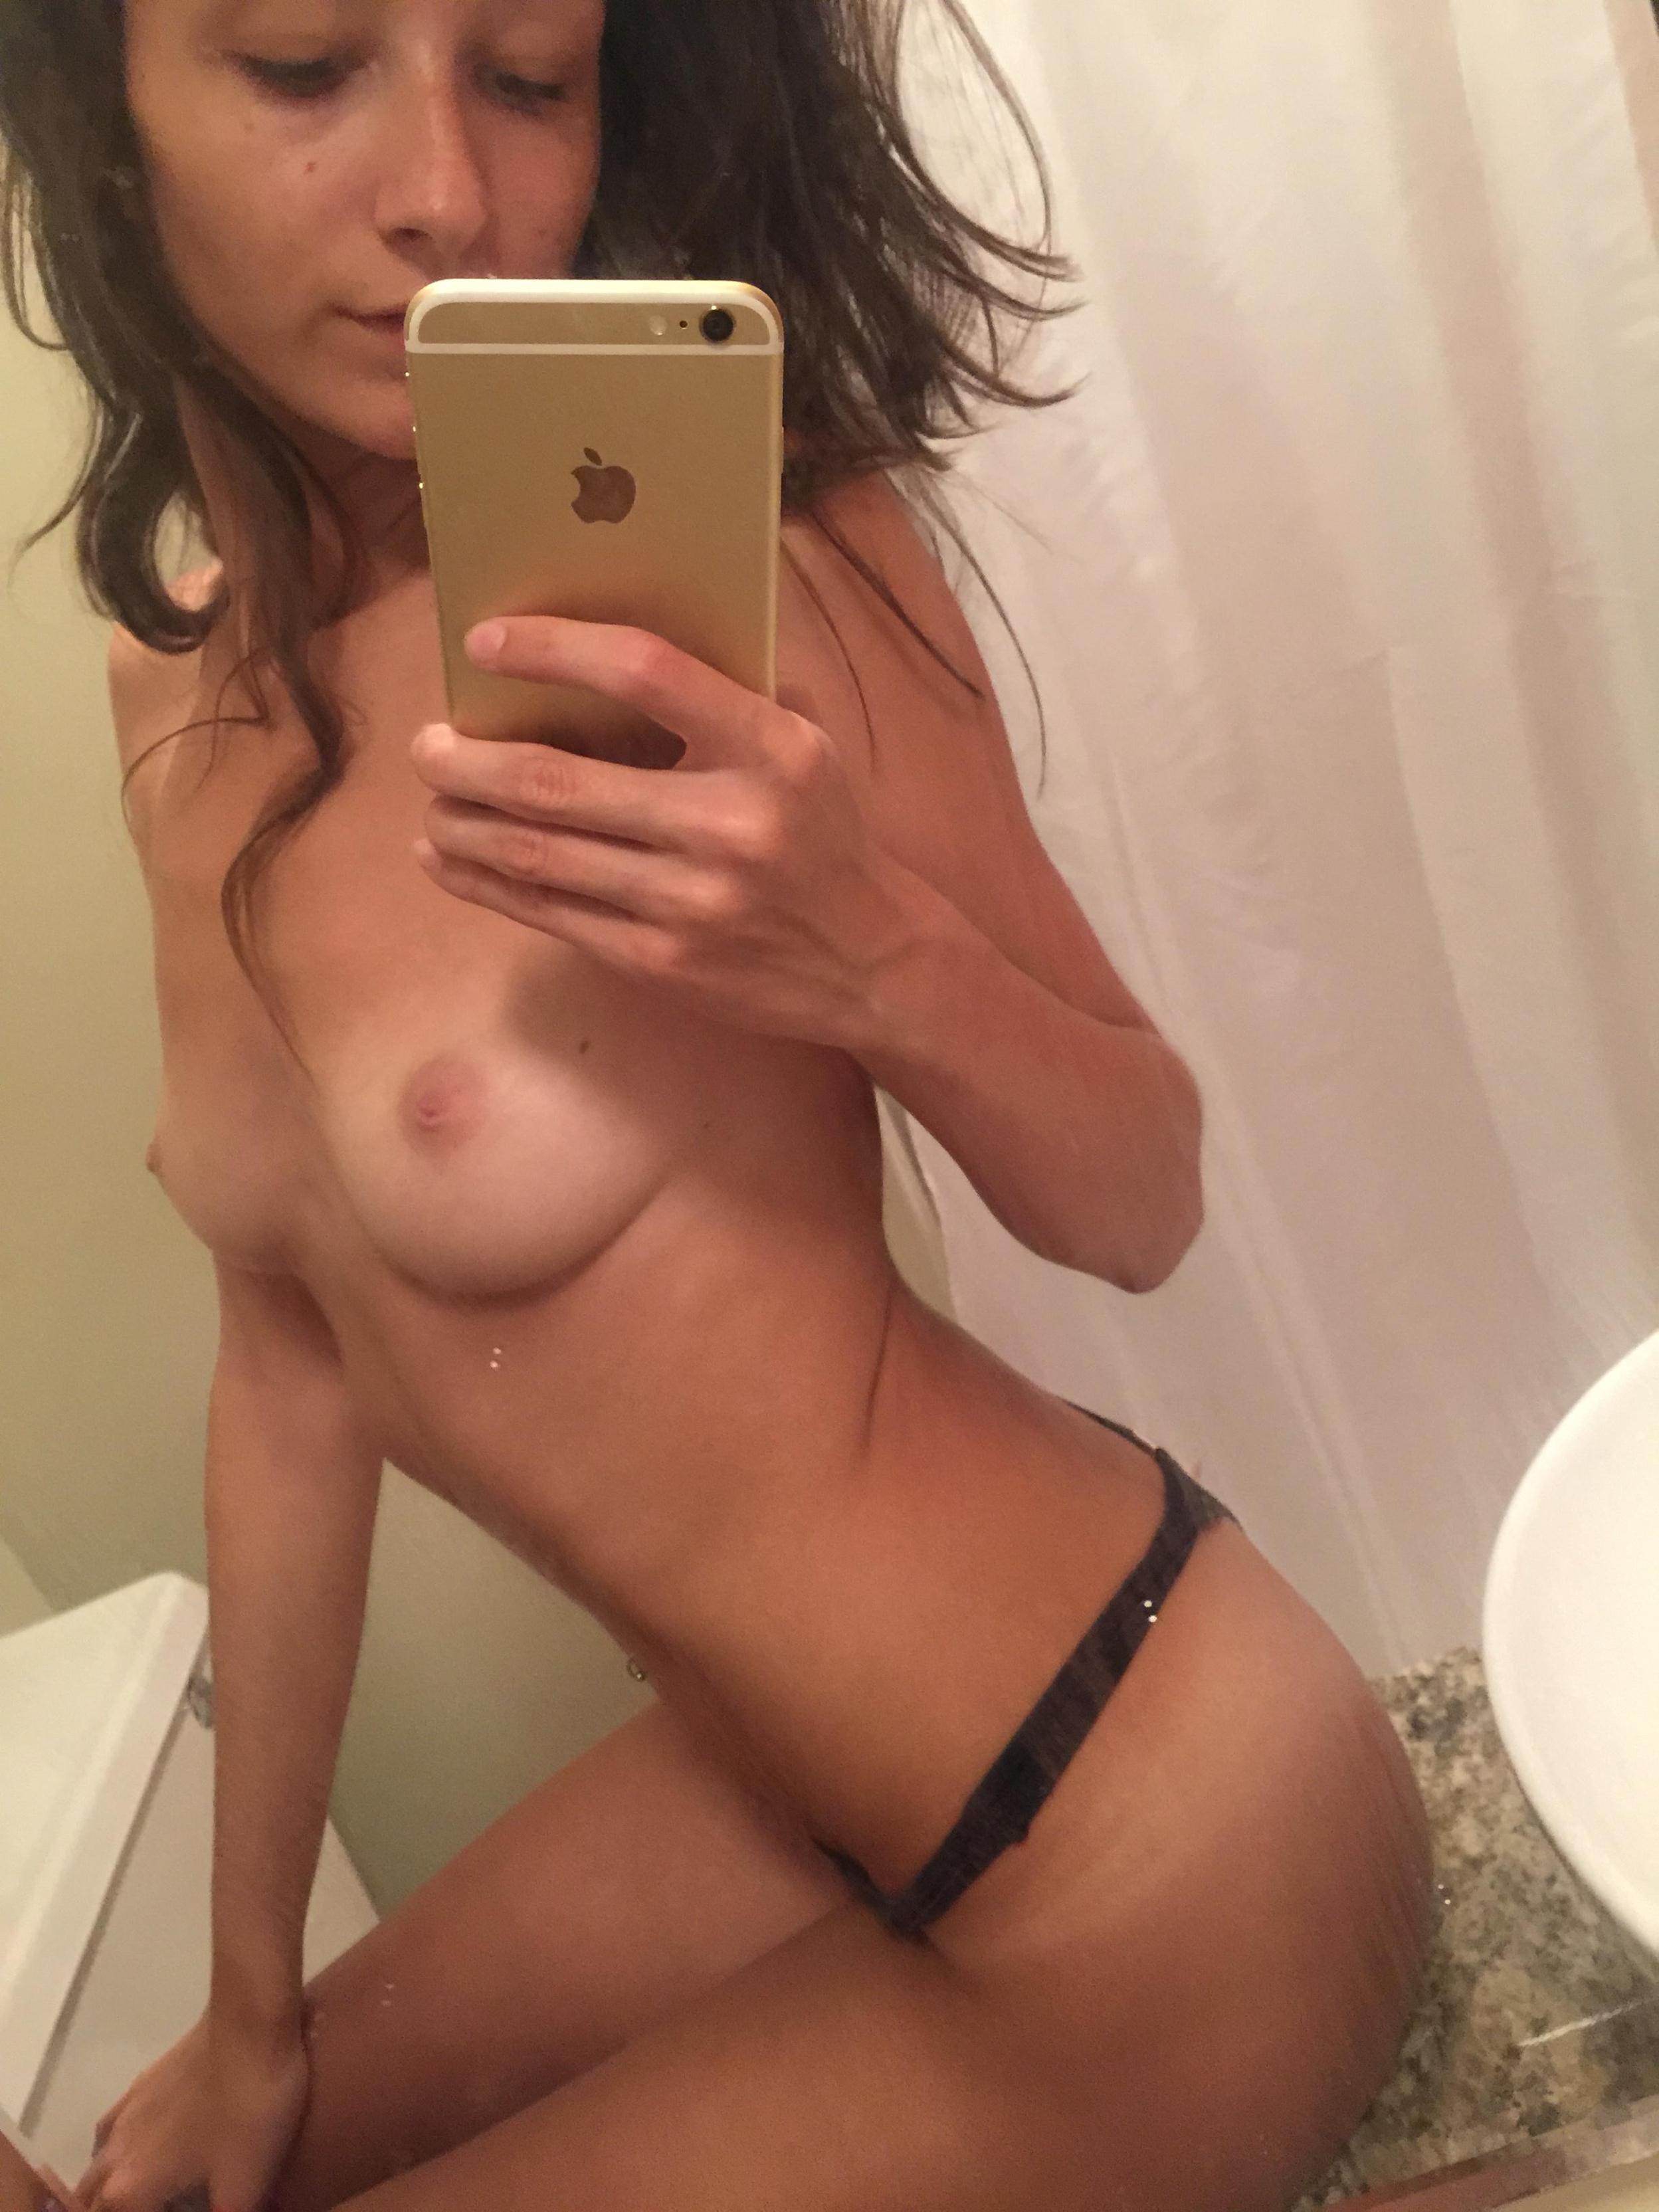 slim-body-amateur-girl-selfie-pics-mirror-nude-12